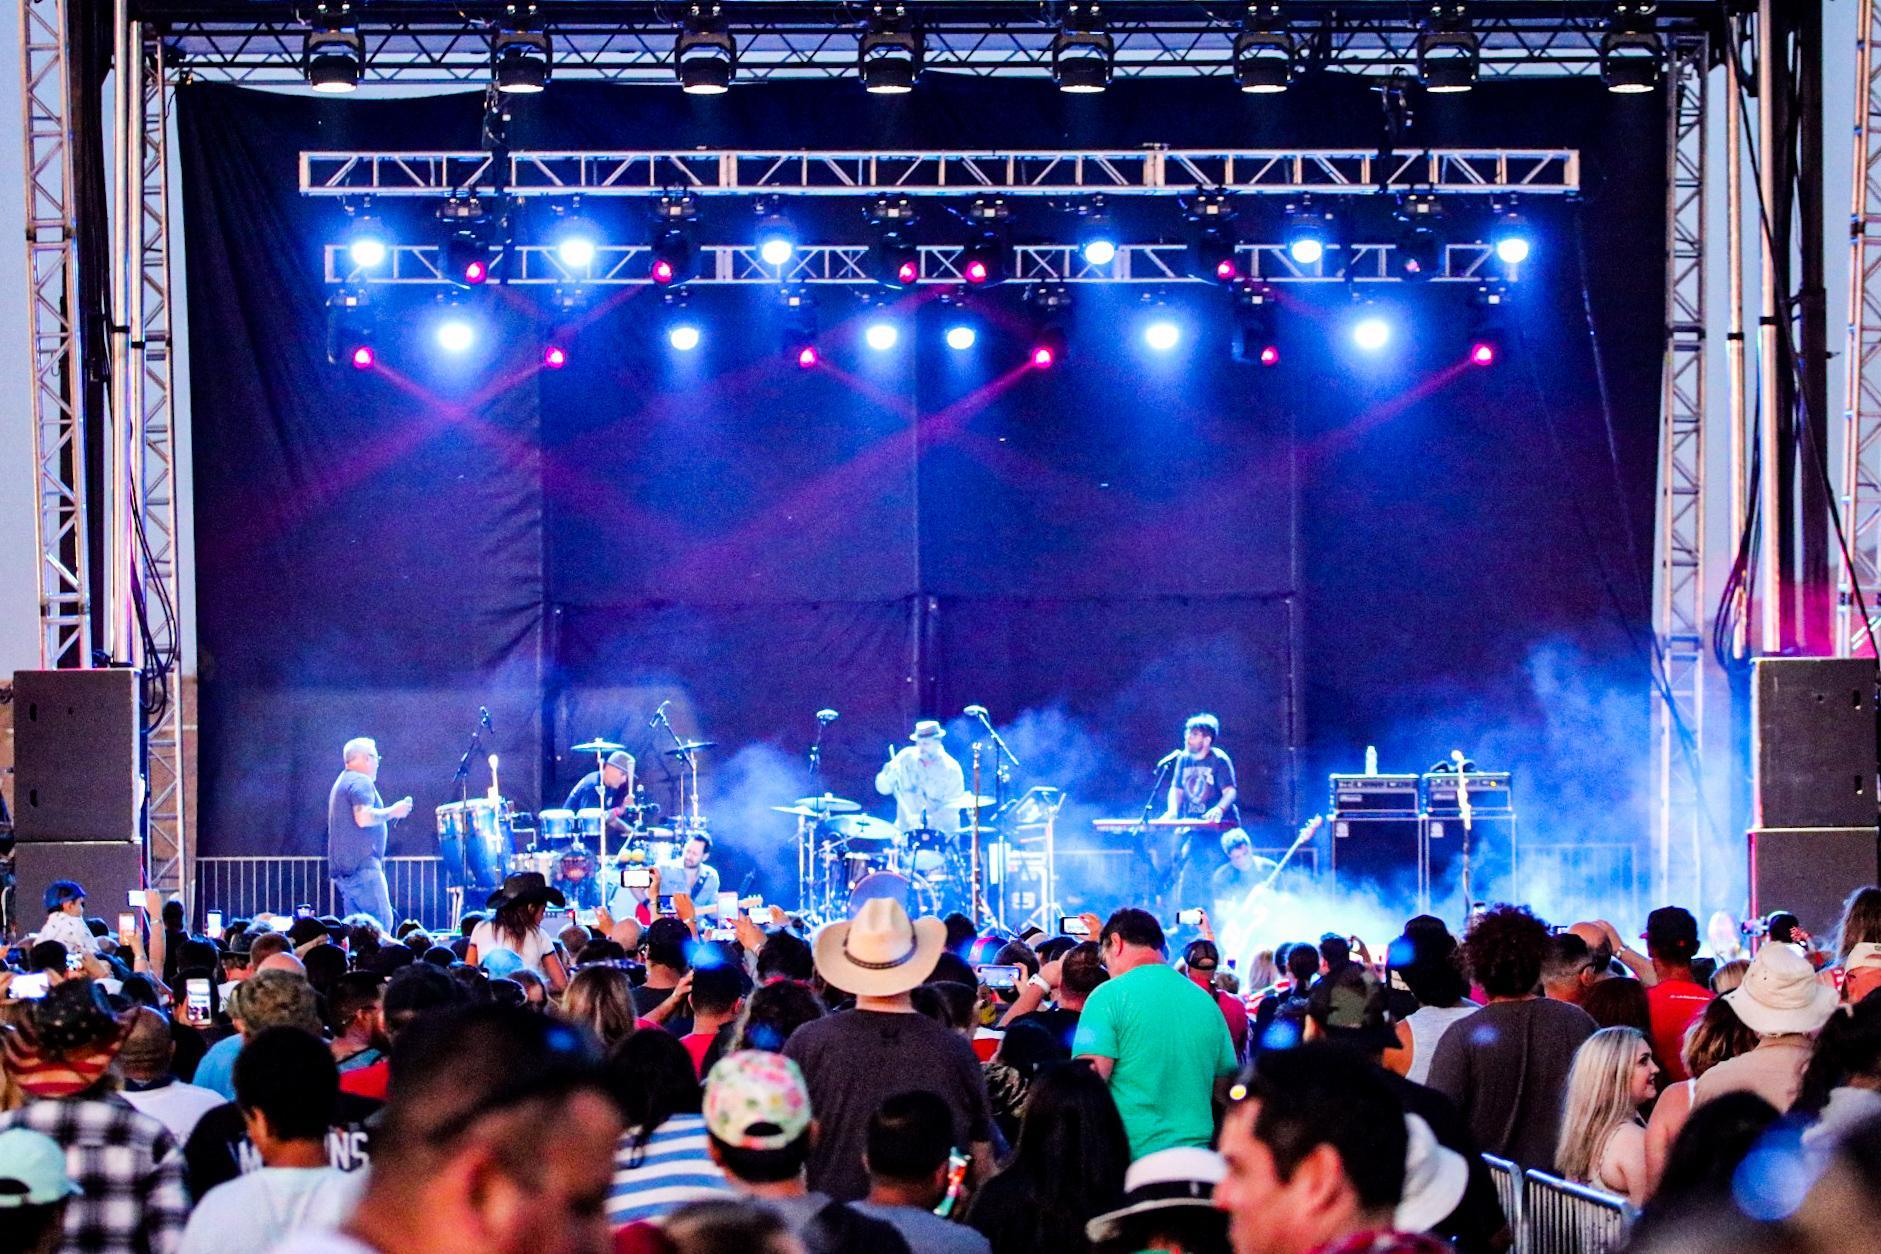 Lighting audio visual concert pro systems av